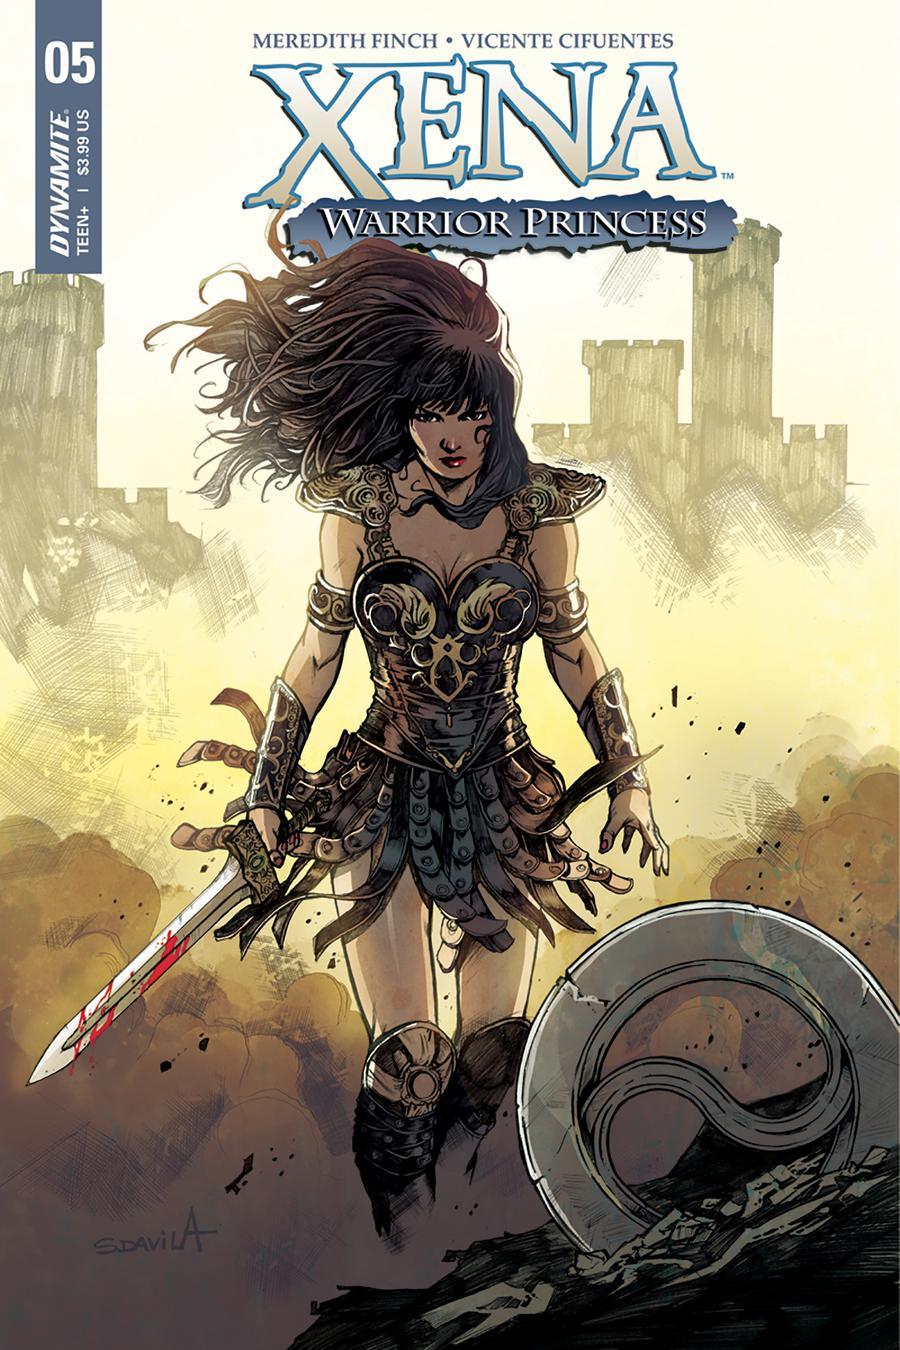 Xena Vol 2 #5 Cover A Regular Sergio Davila Cover